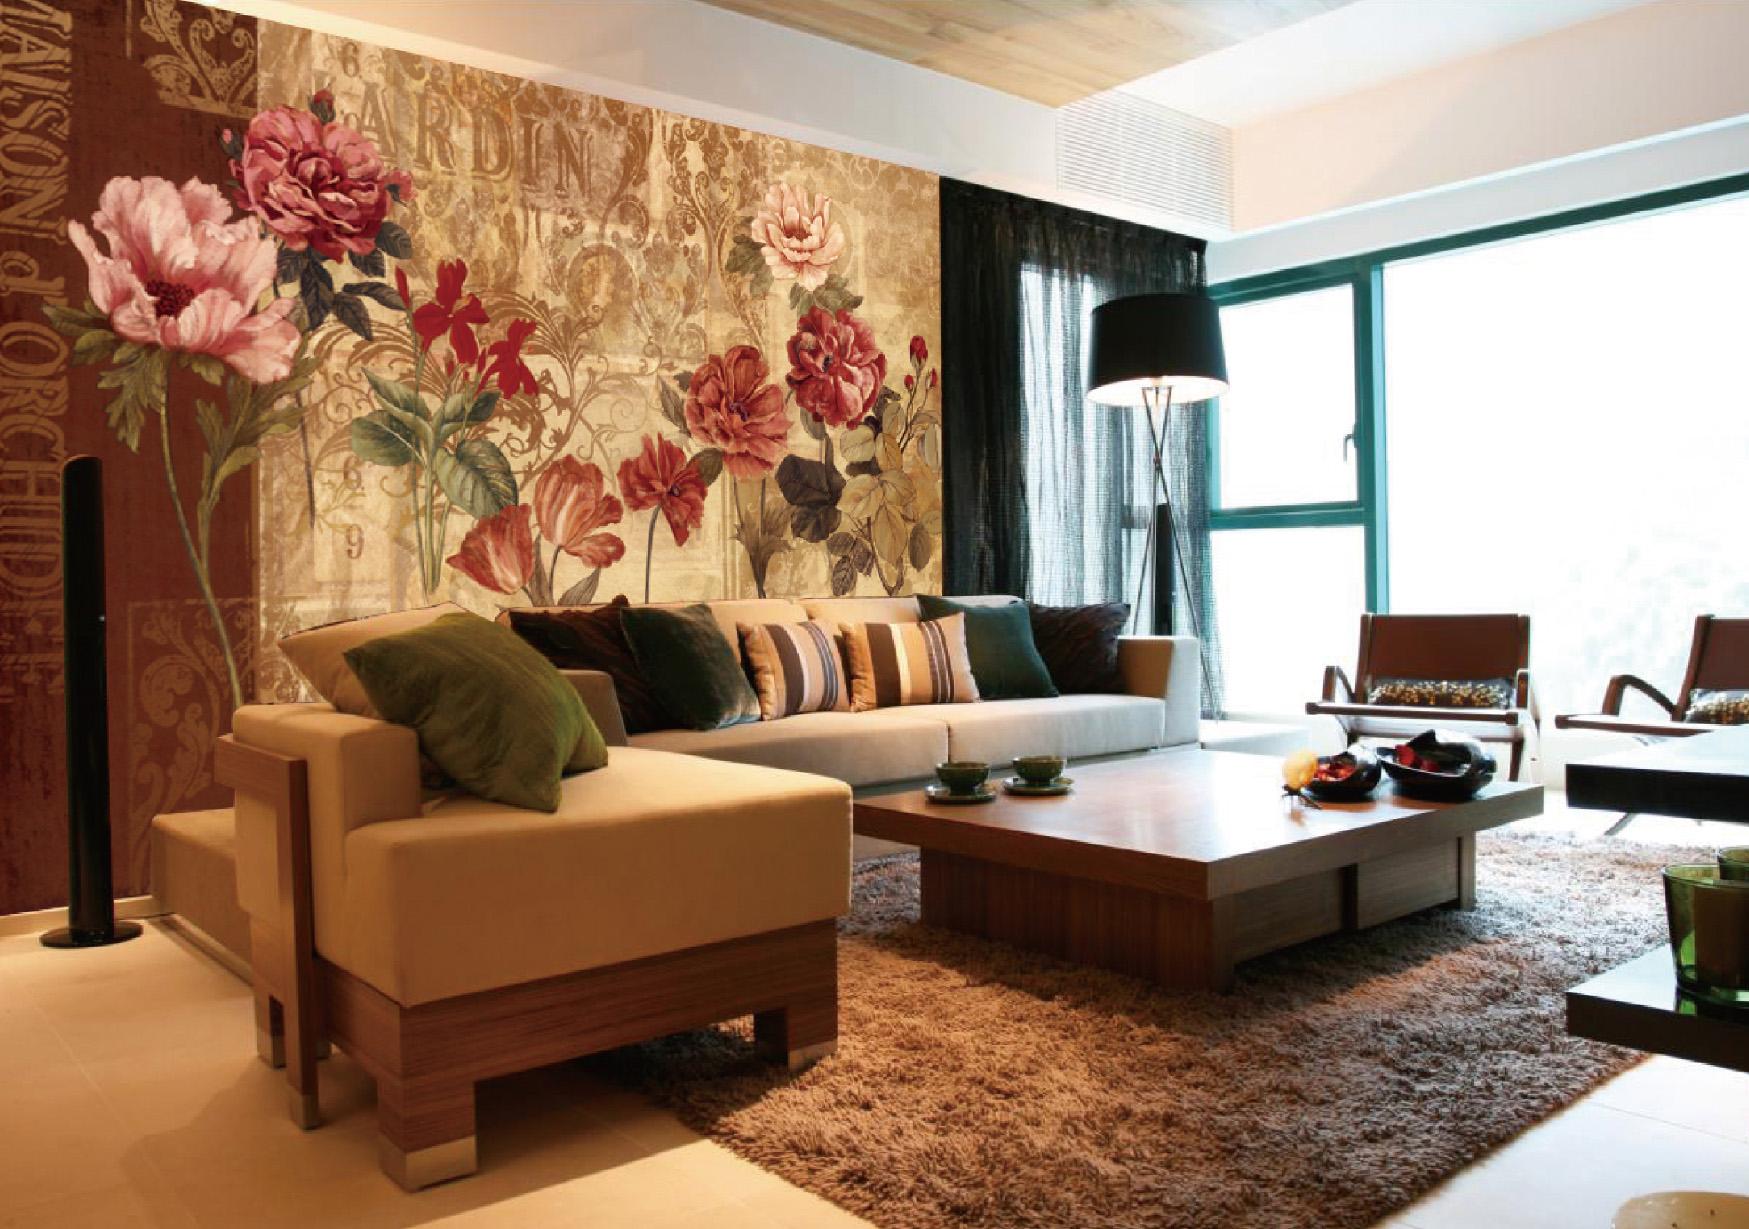 Retro Flowers Wall Mural 8106